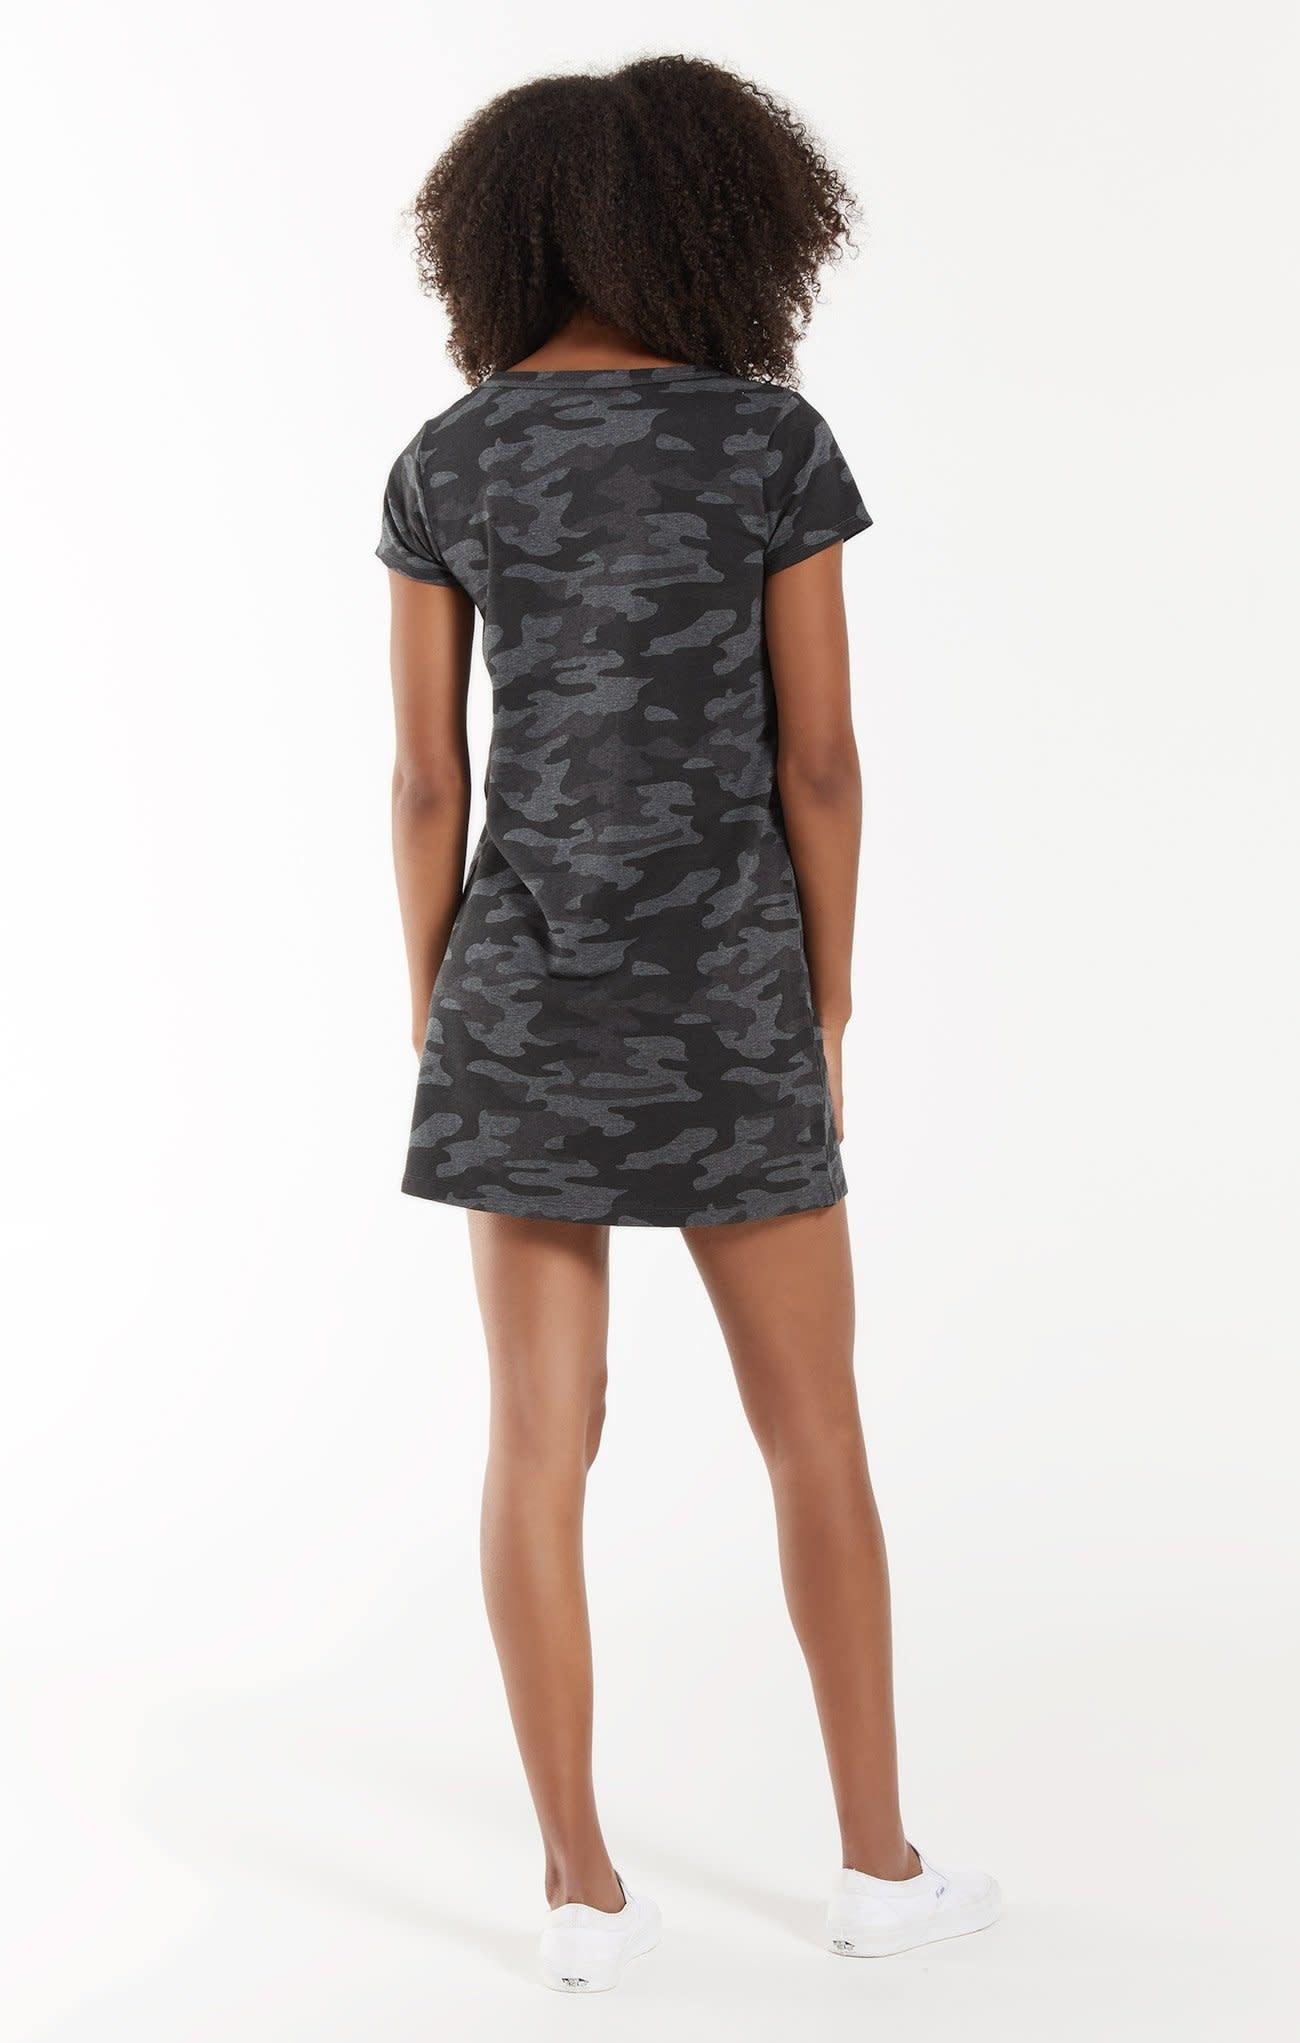 Z Supply Payton Camo Tee Dress